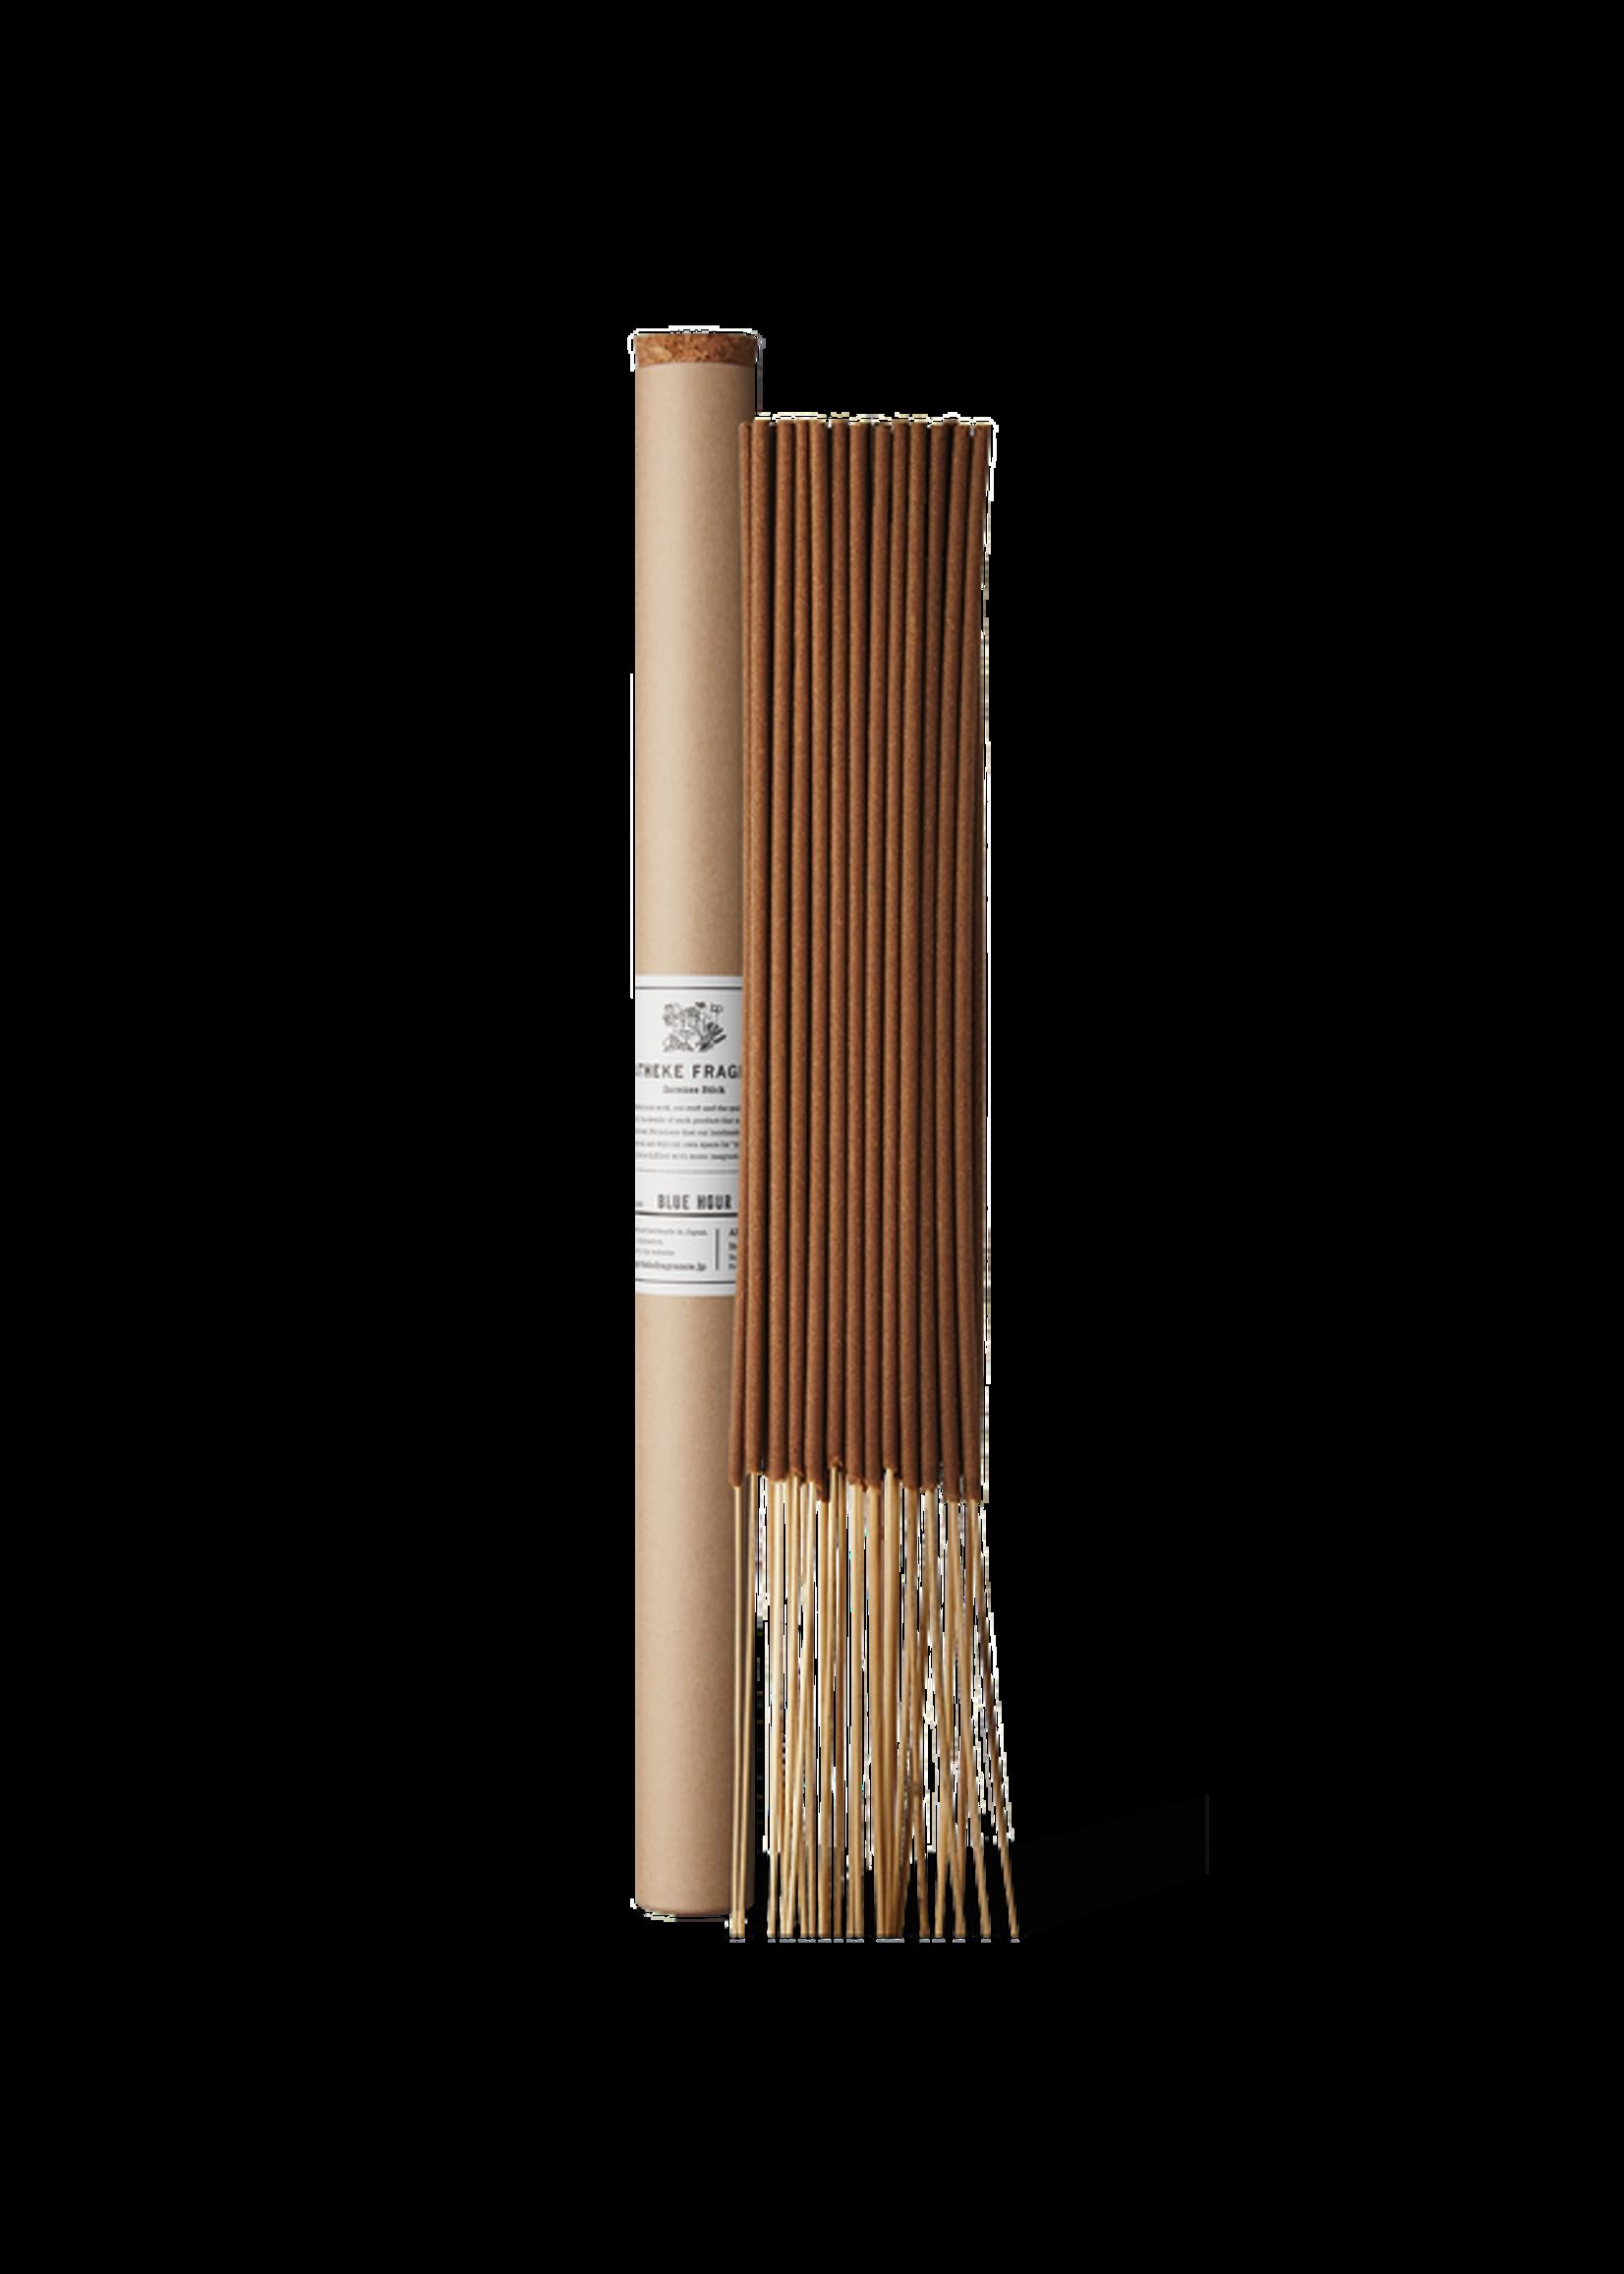 APFR Japan Japanese Incense: Blue Hour